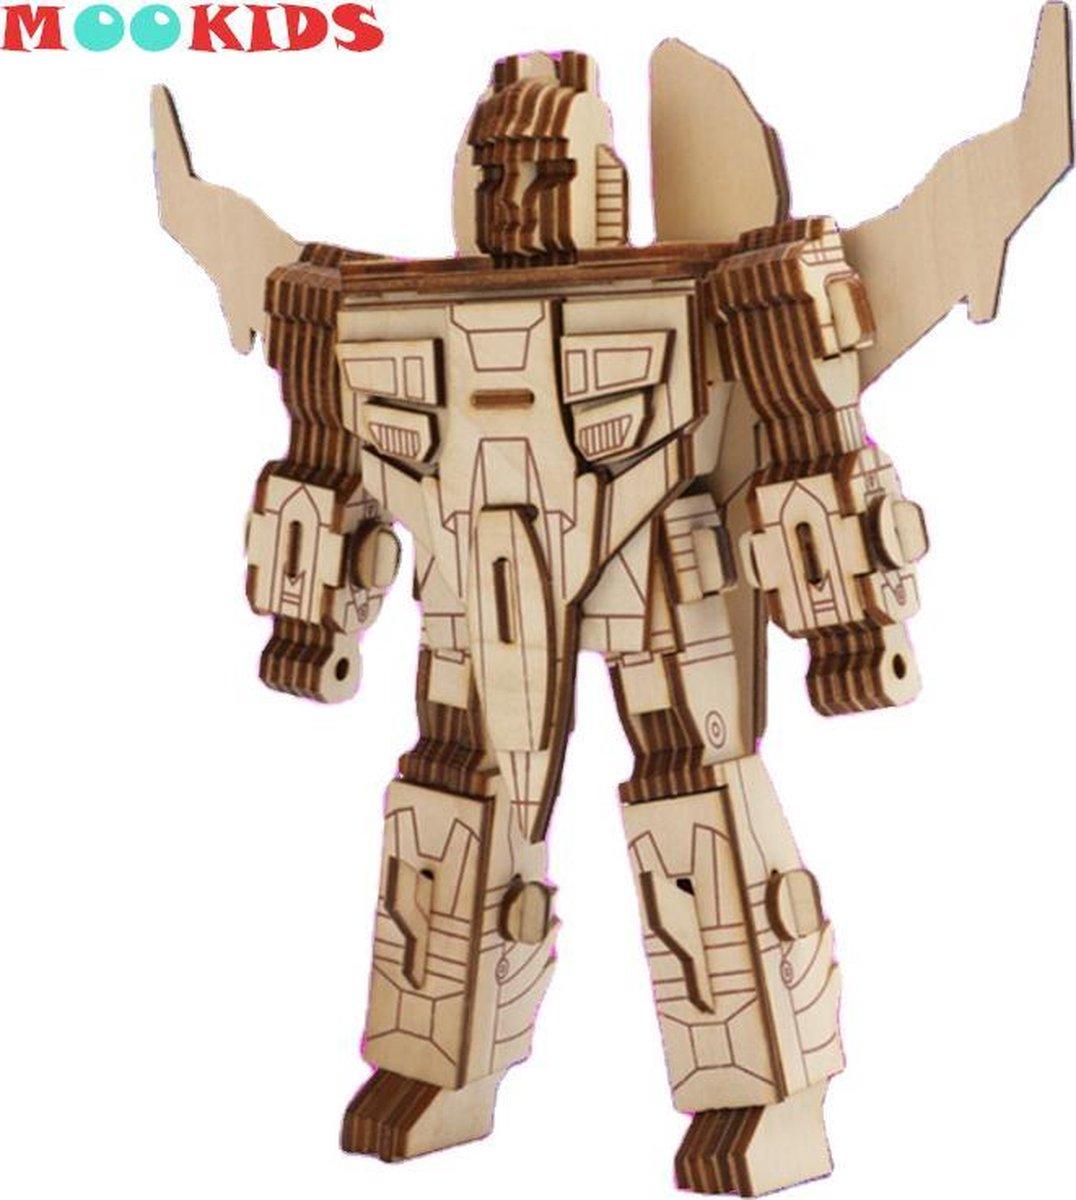 Mookids - Modelbouw Hout - 3D Puzzel - Robot Wings - 97 stukken